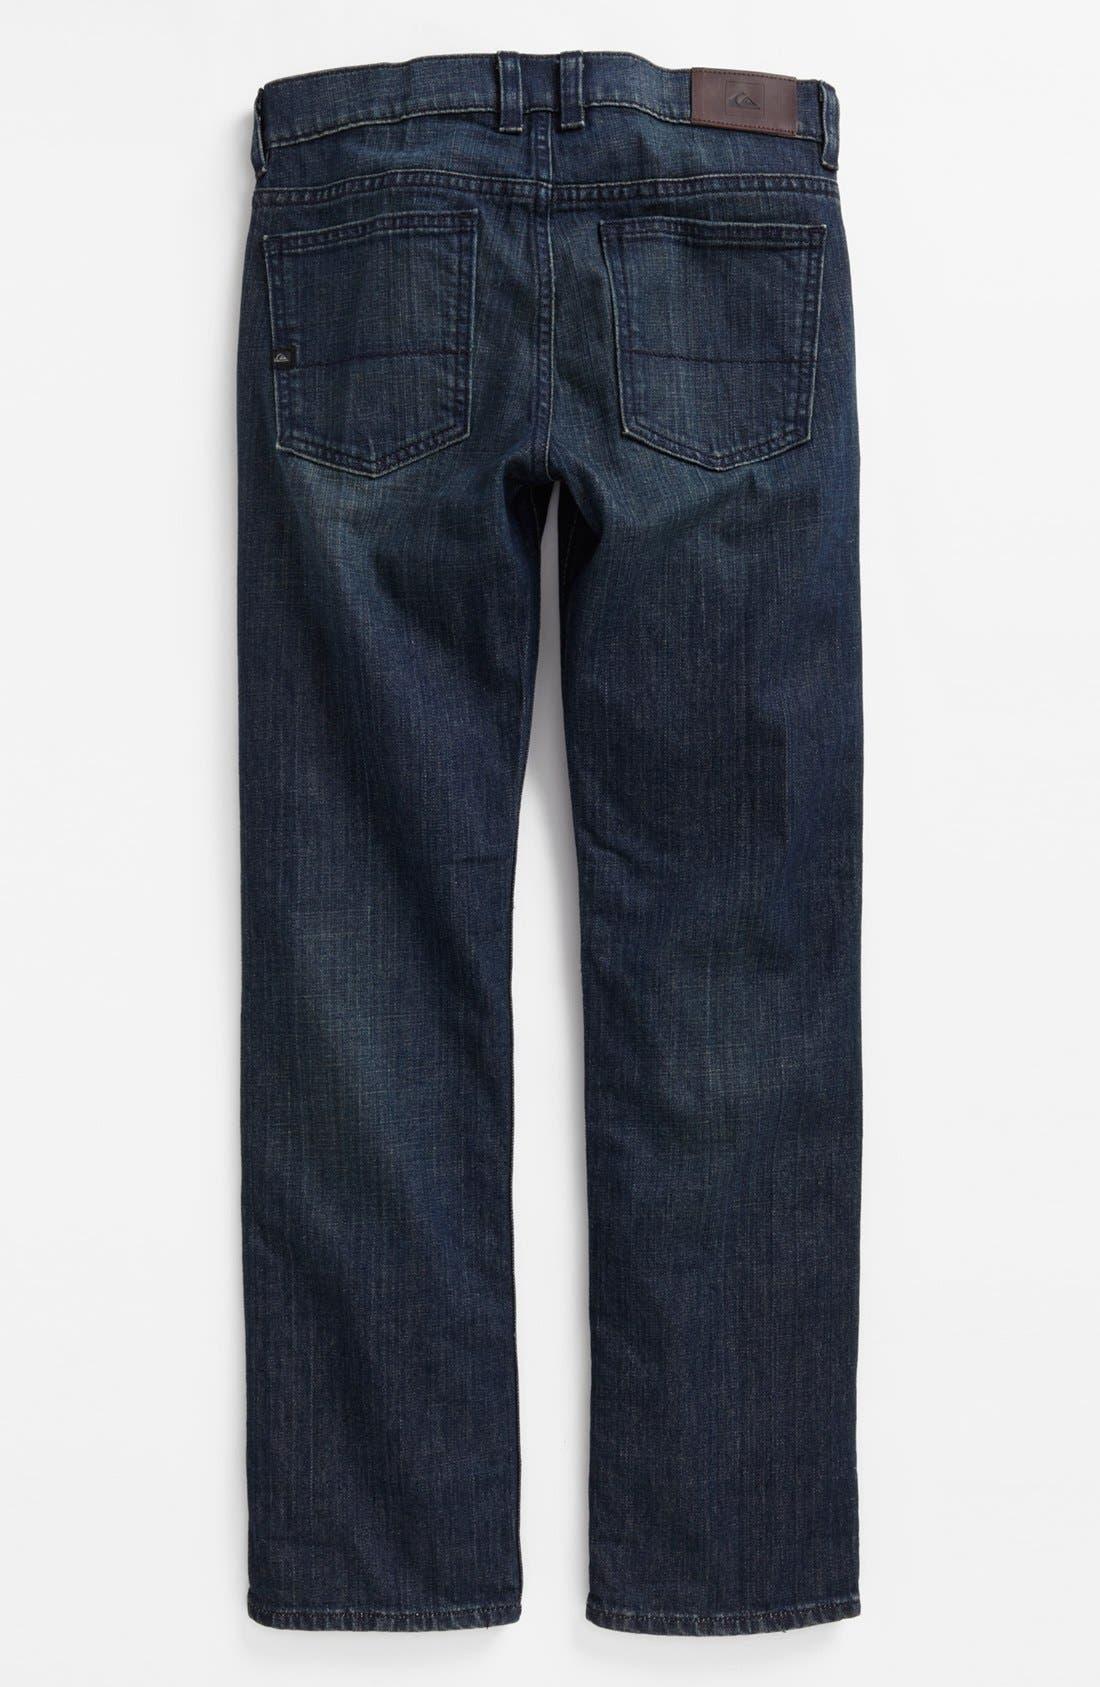 Main Image - Quiksilver 'Revolver' Straight Leg Jeans (Little Boys)